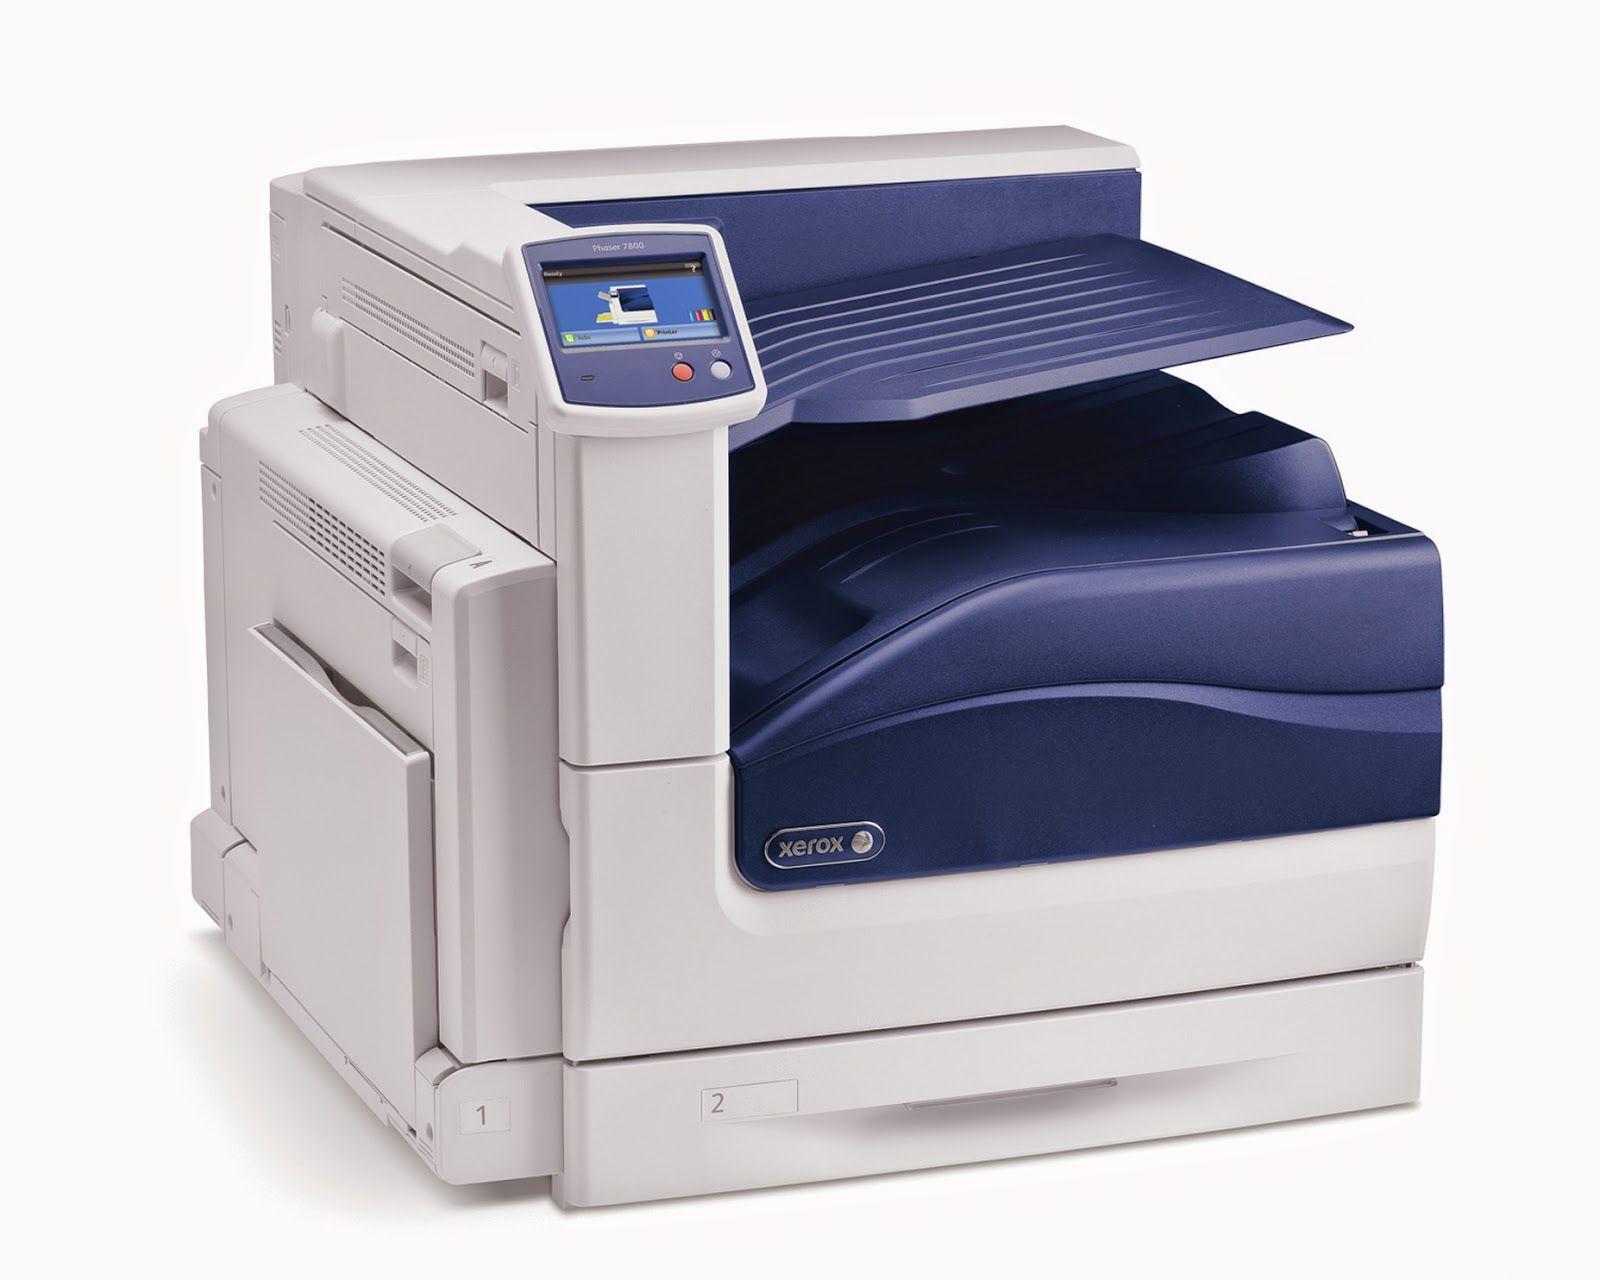 Fuji Xerox Phaser 7800 Driver Download Laser Printer Printer